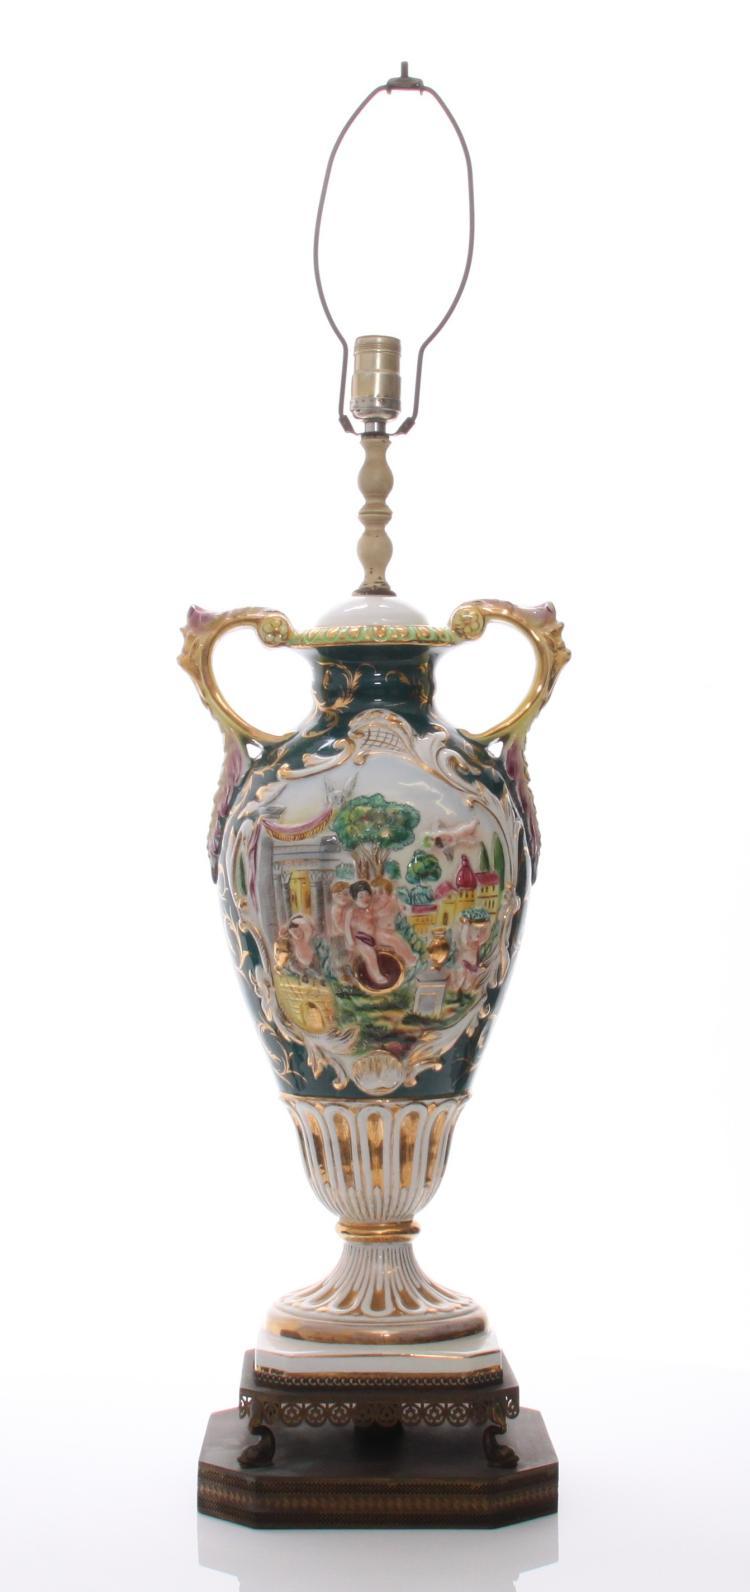 Capodimonte Porcelain Lamp. Condition Report: